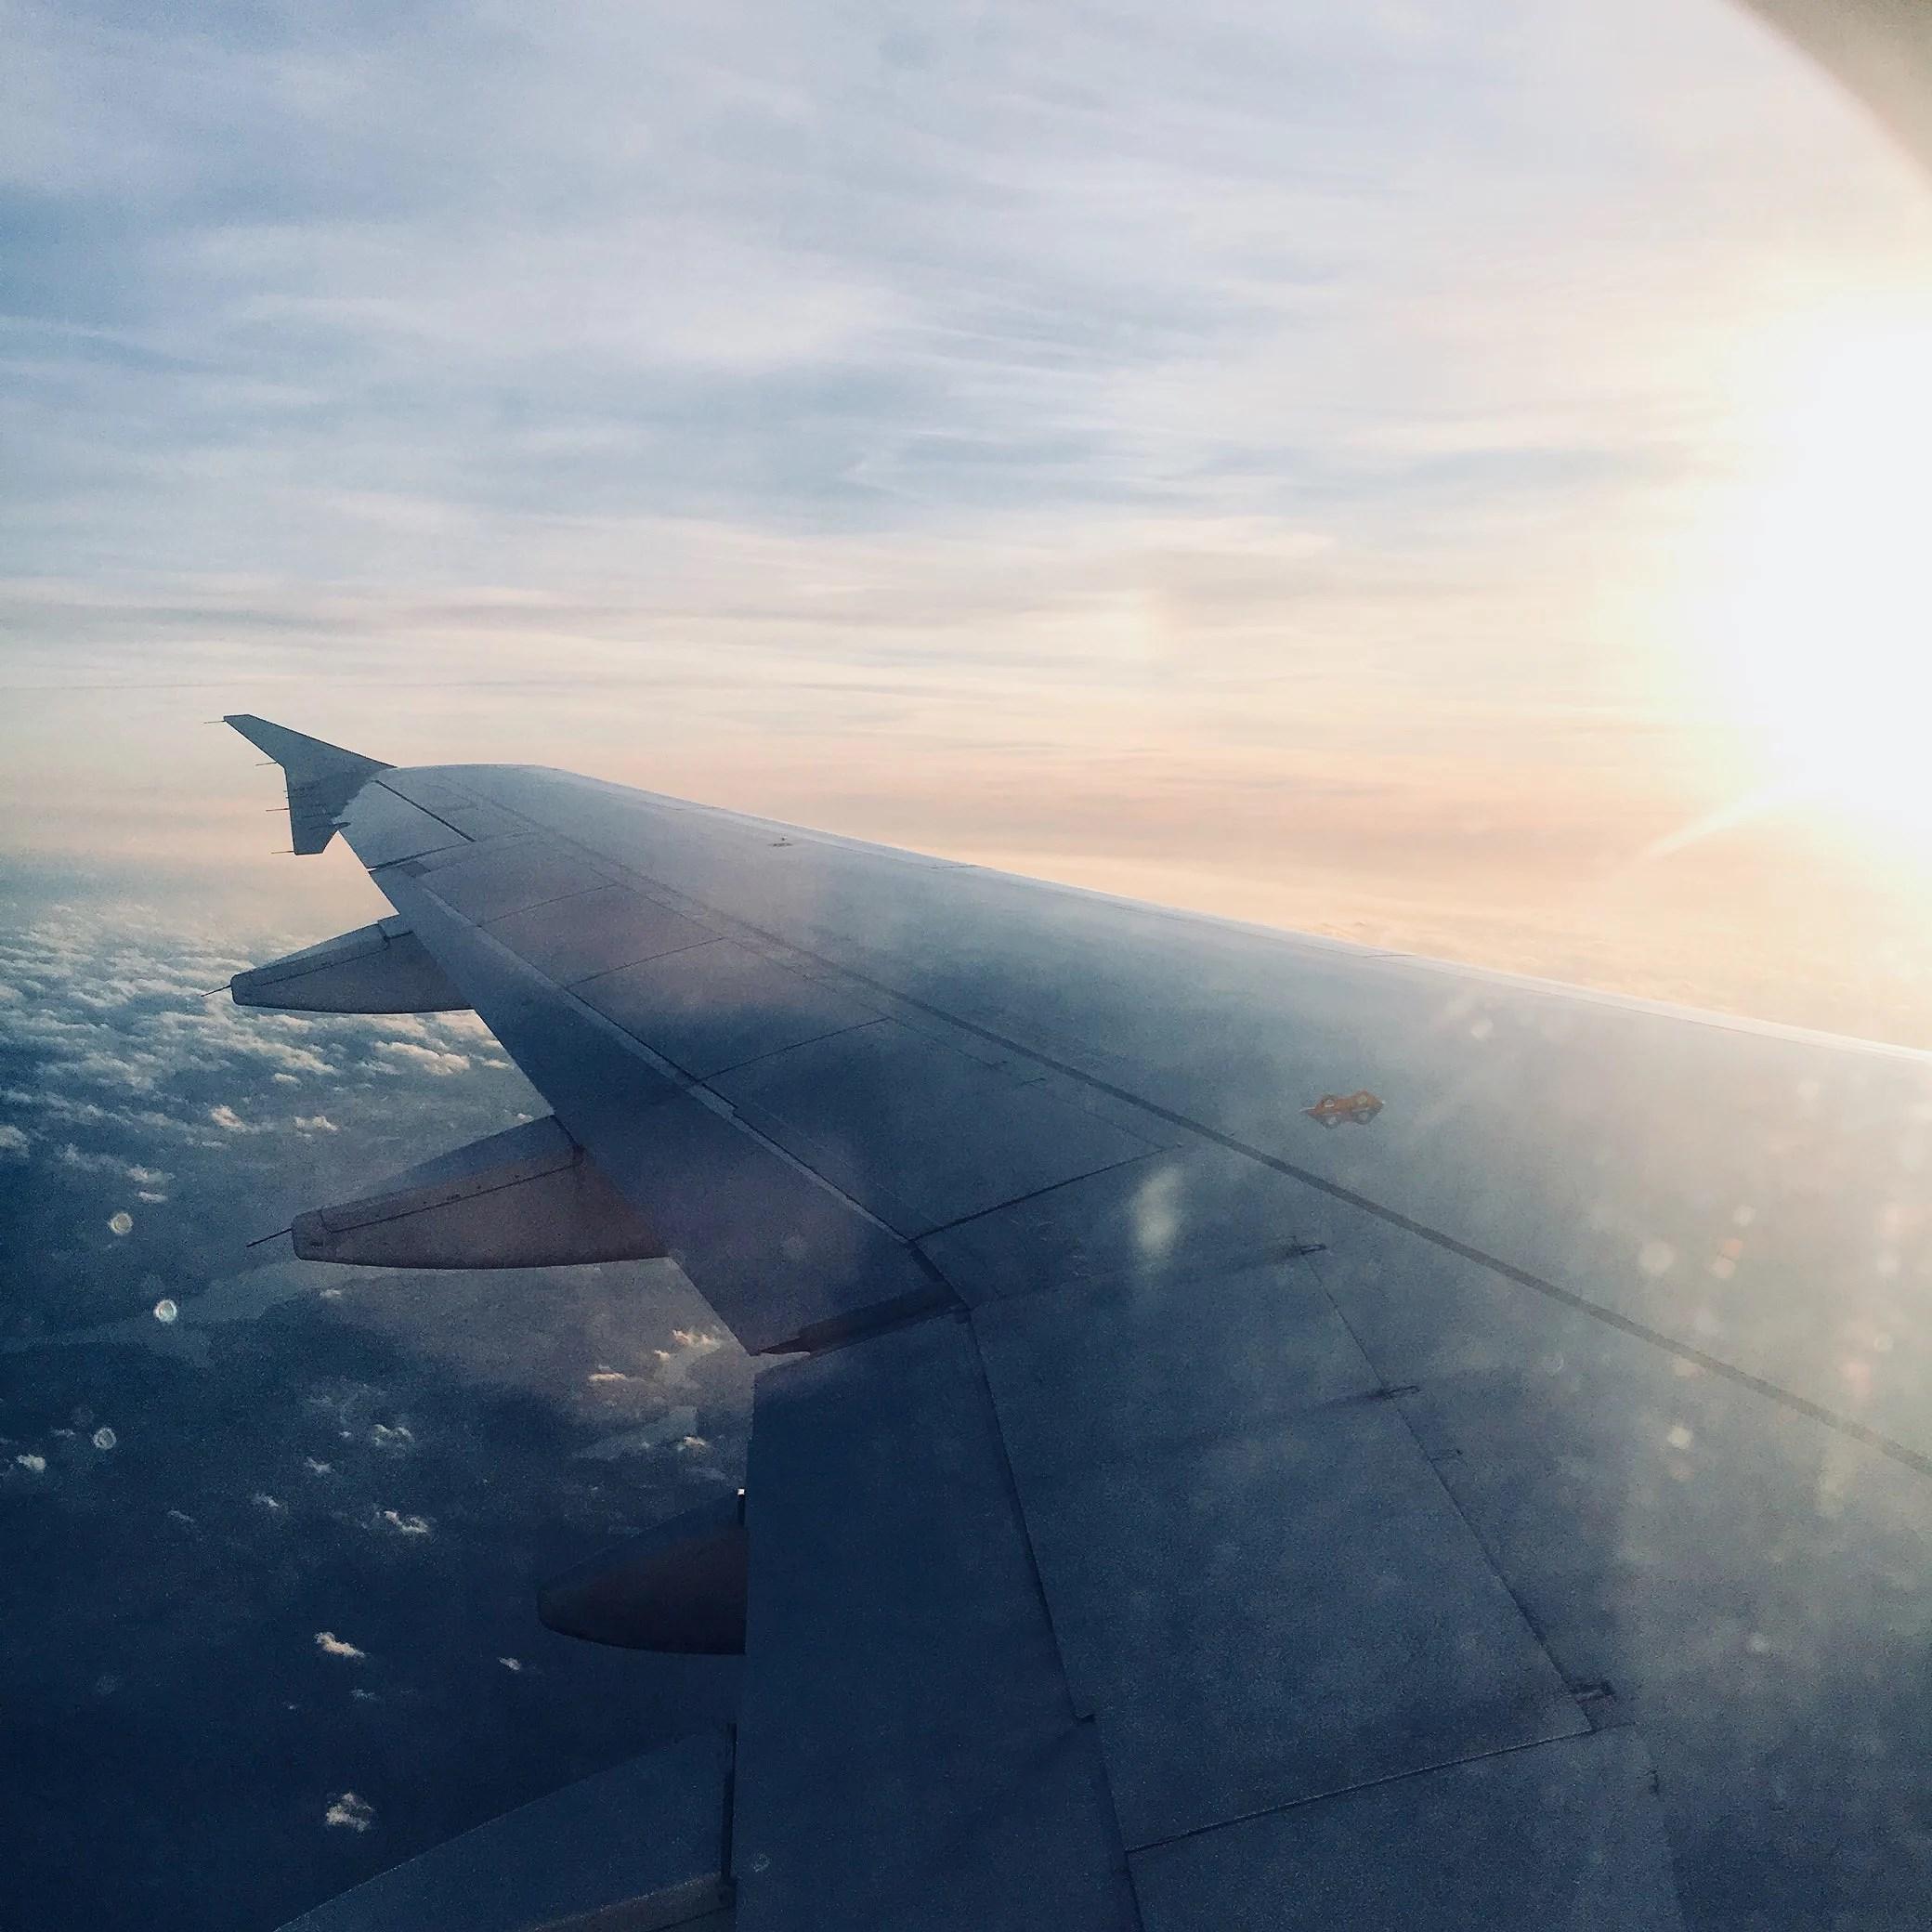 SAS Airlines